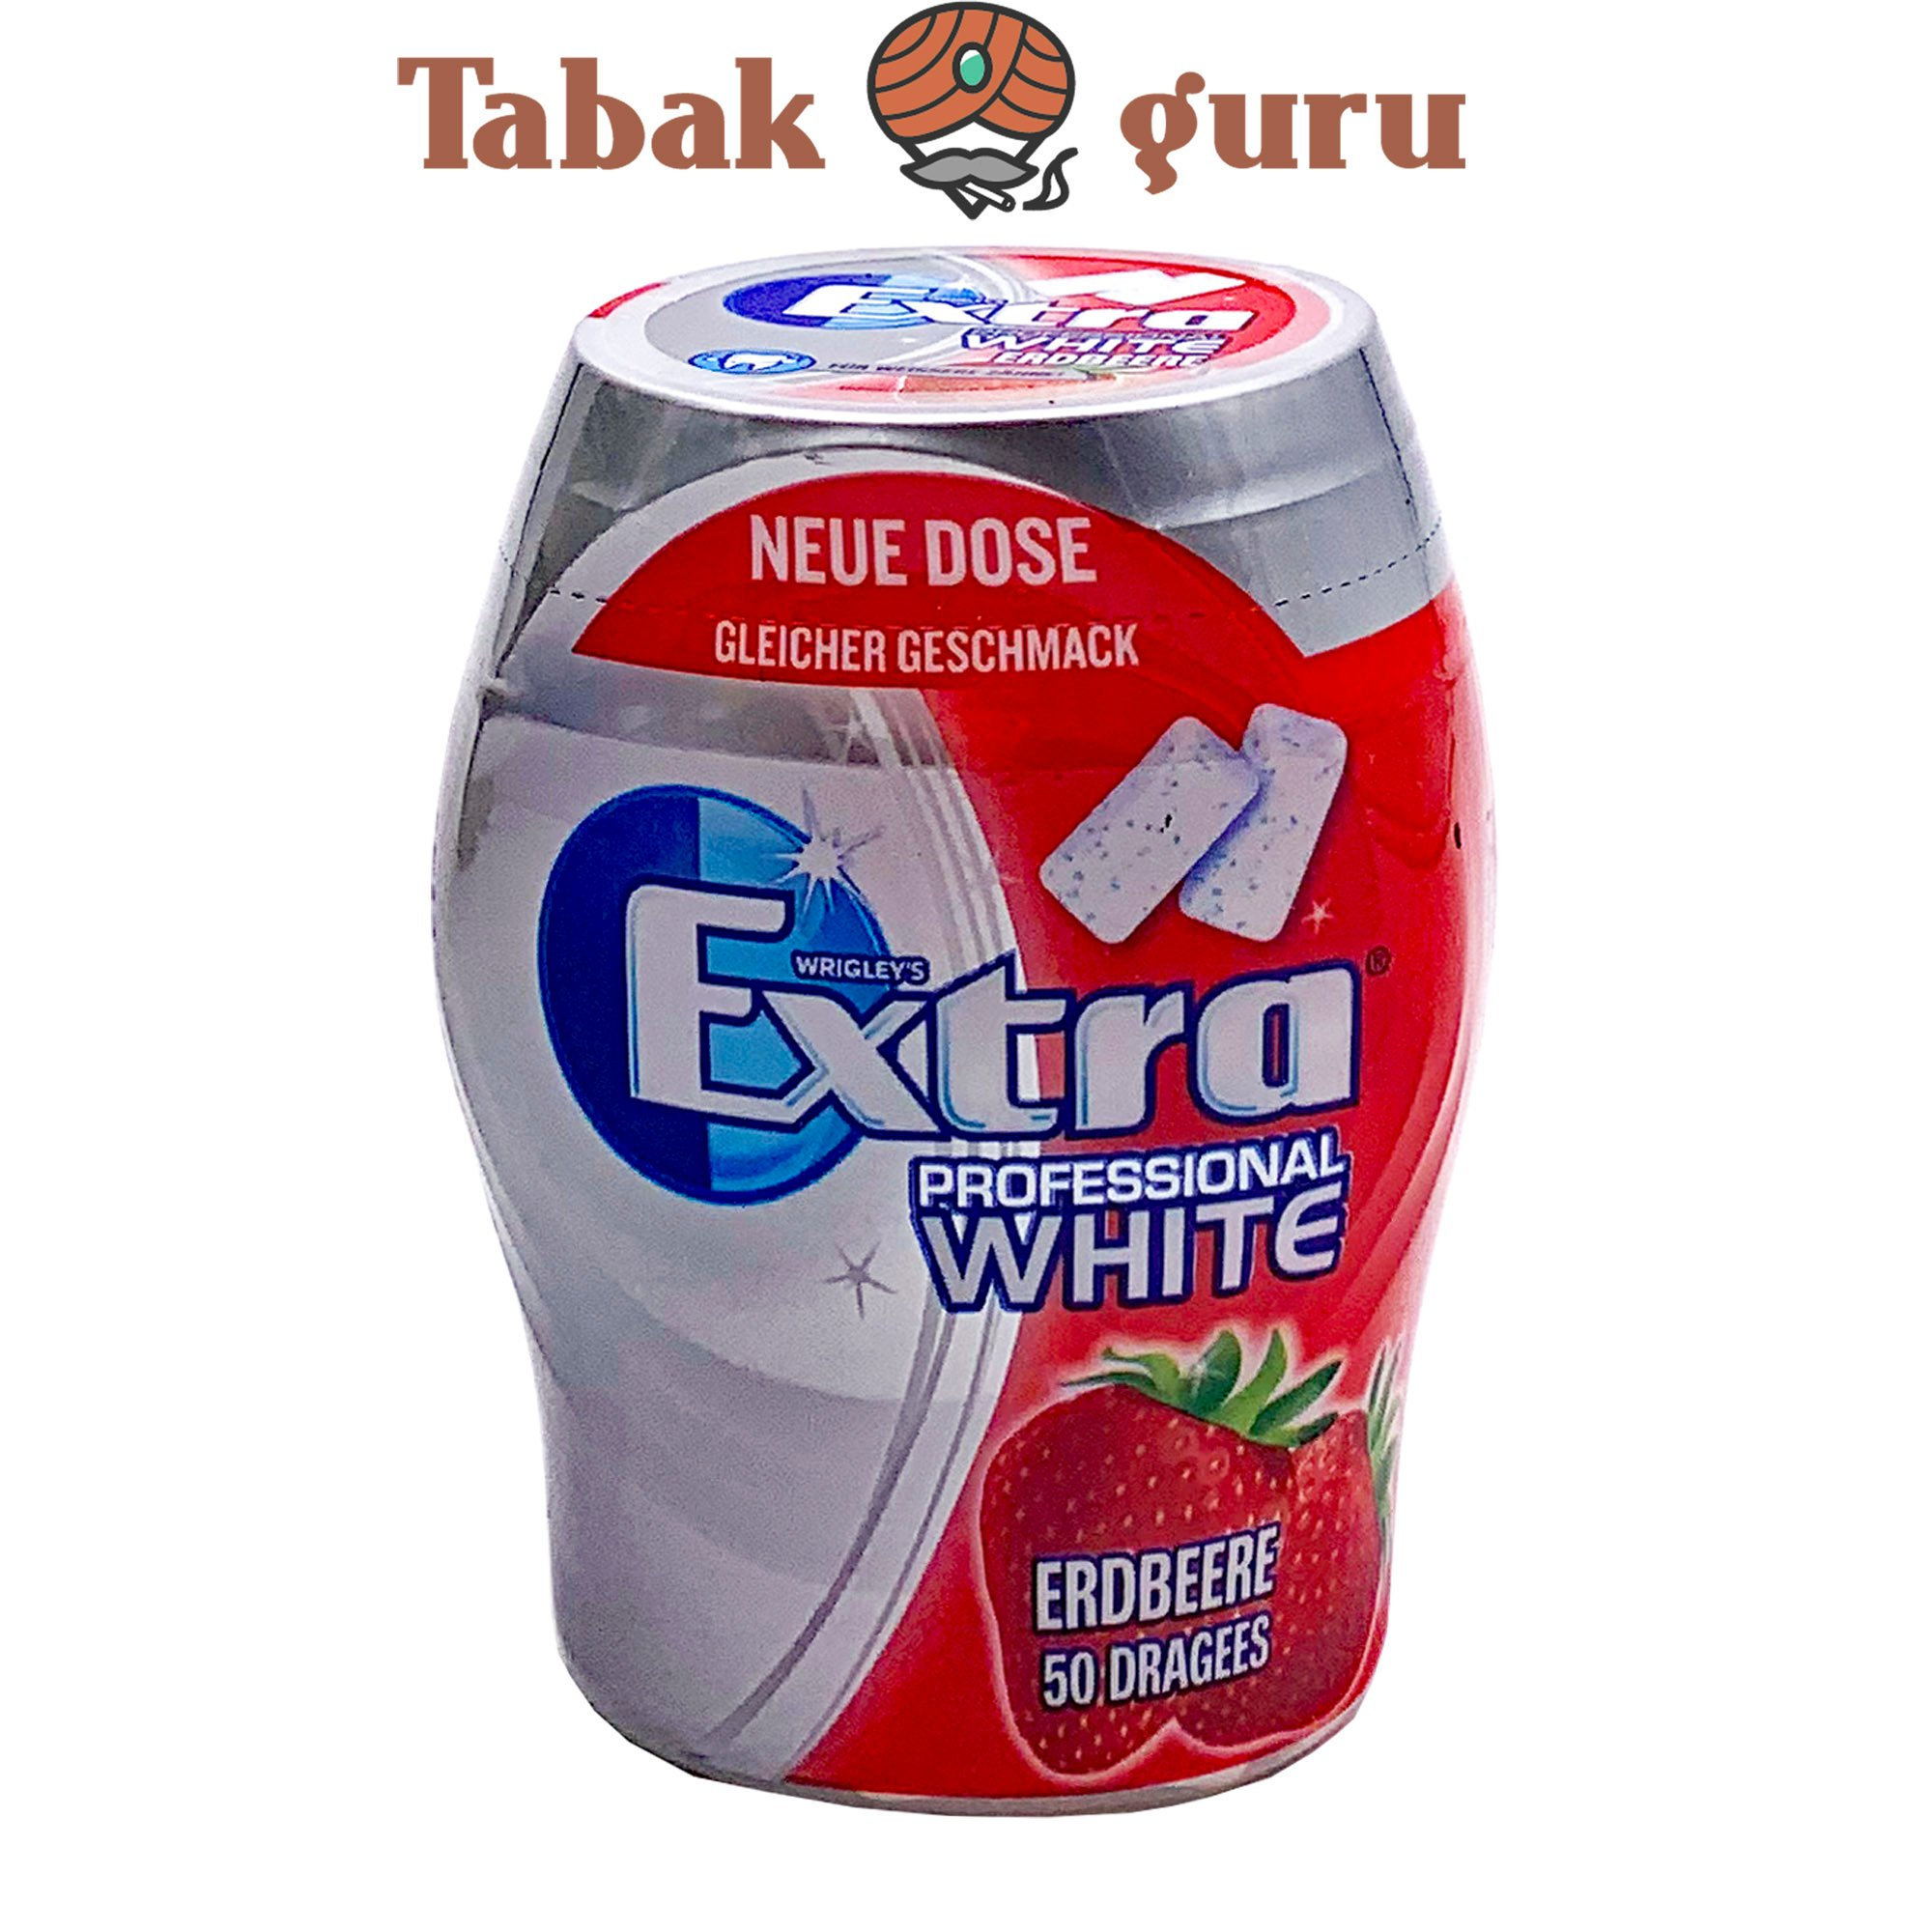 Wrigleys Extra Professional White Erdbeere Geschmack Inhalt 50 Dragees